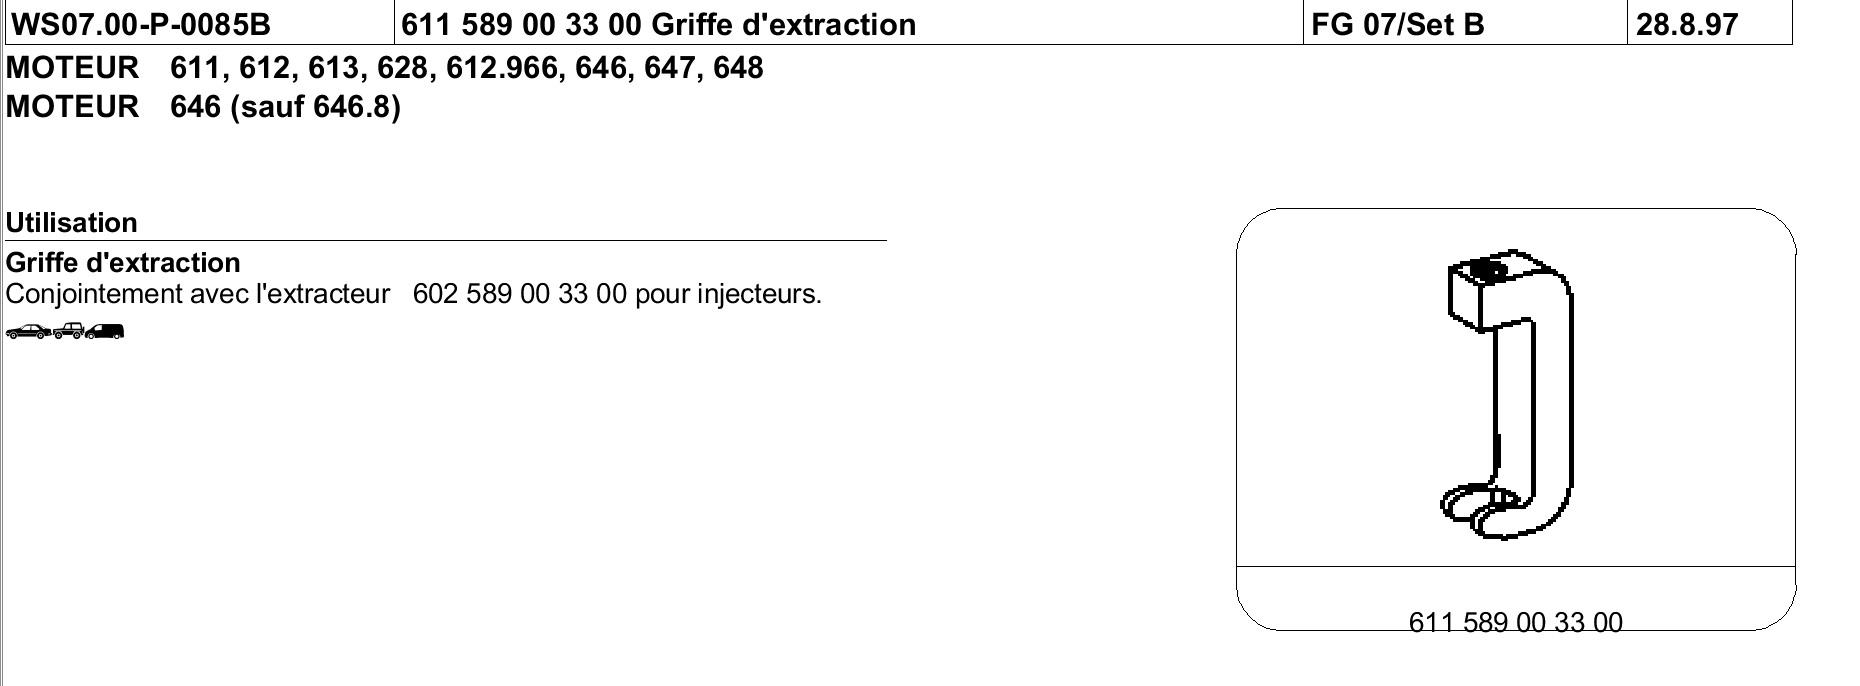 griffe-extraction-injecteur-moteur-646_9.jpg